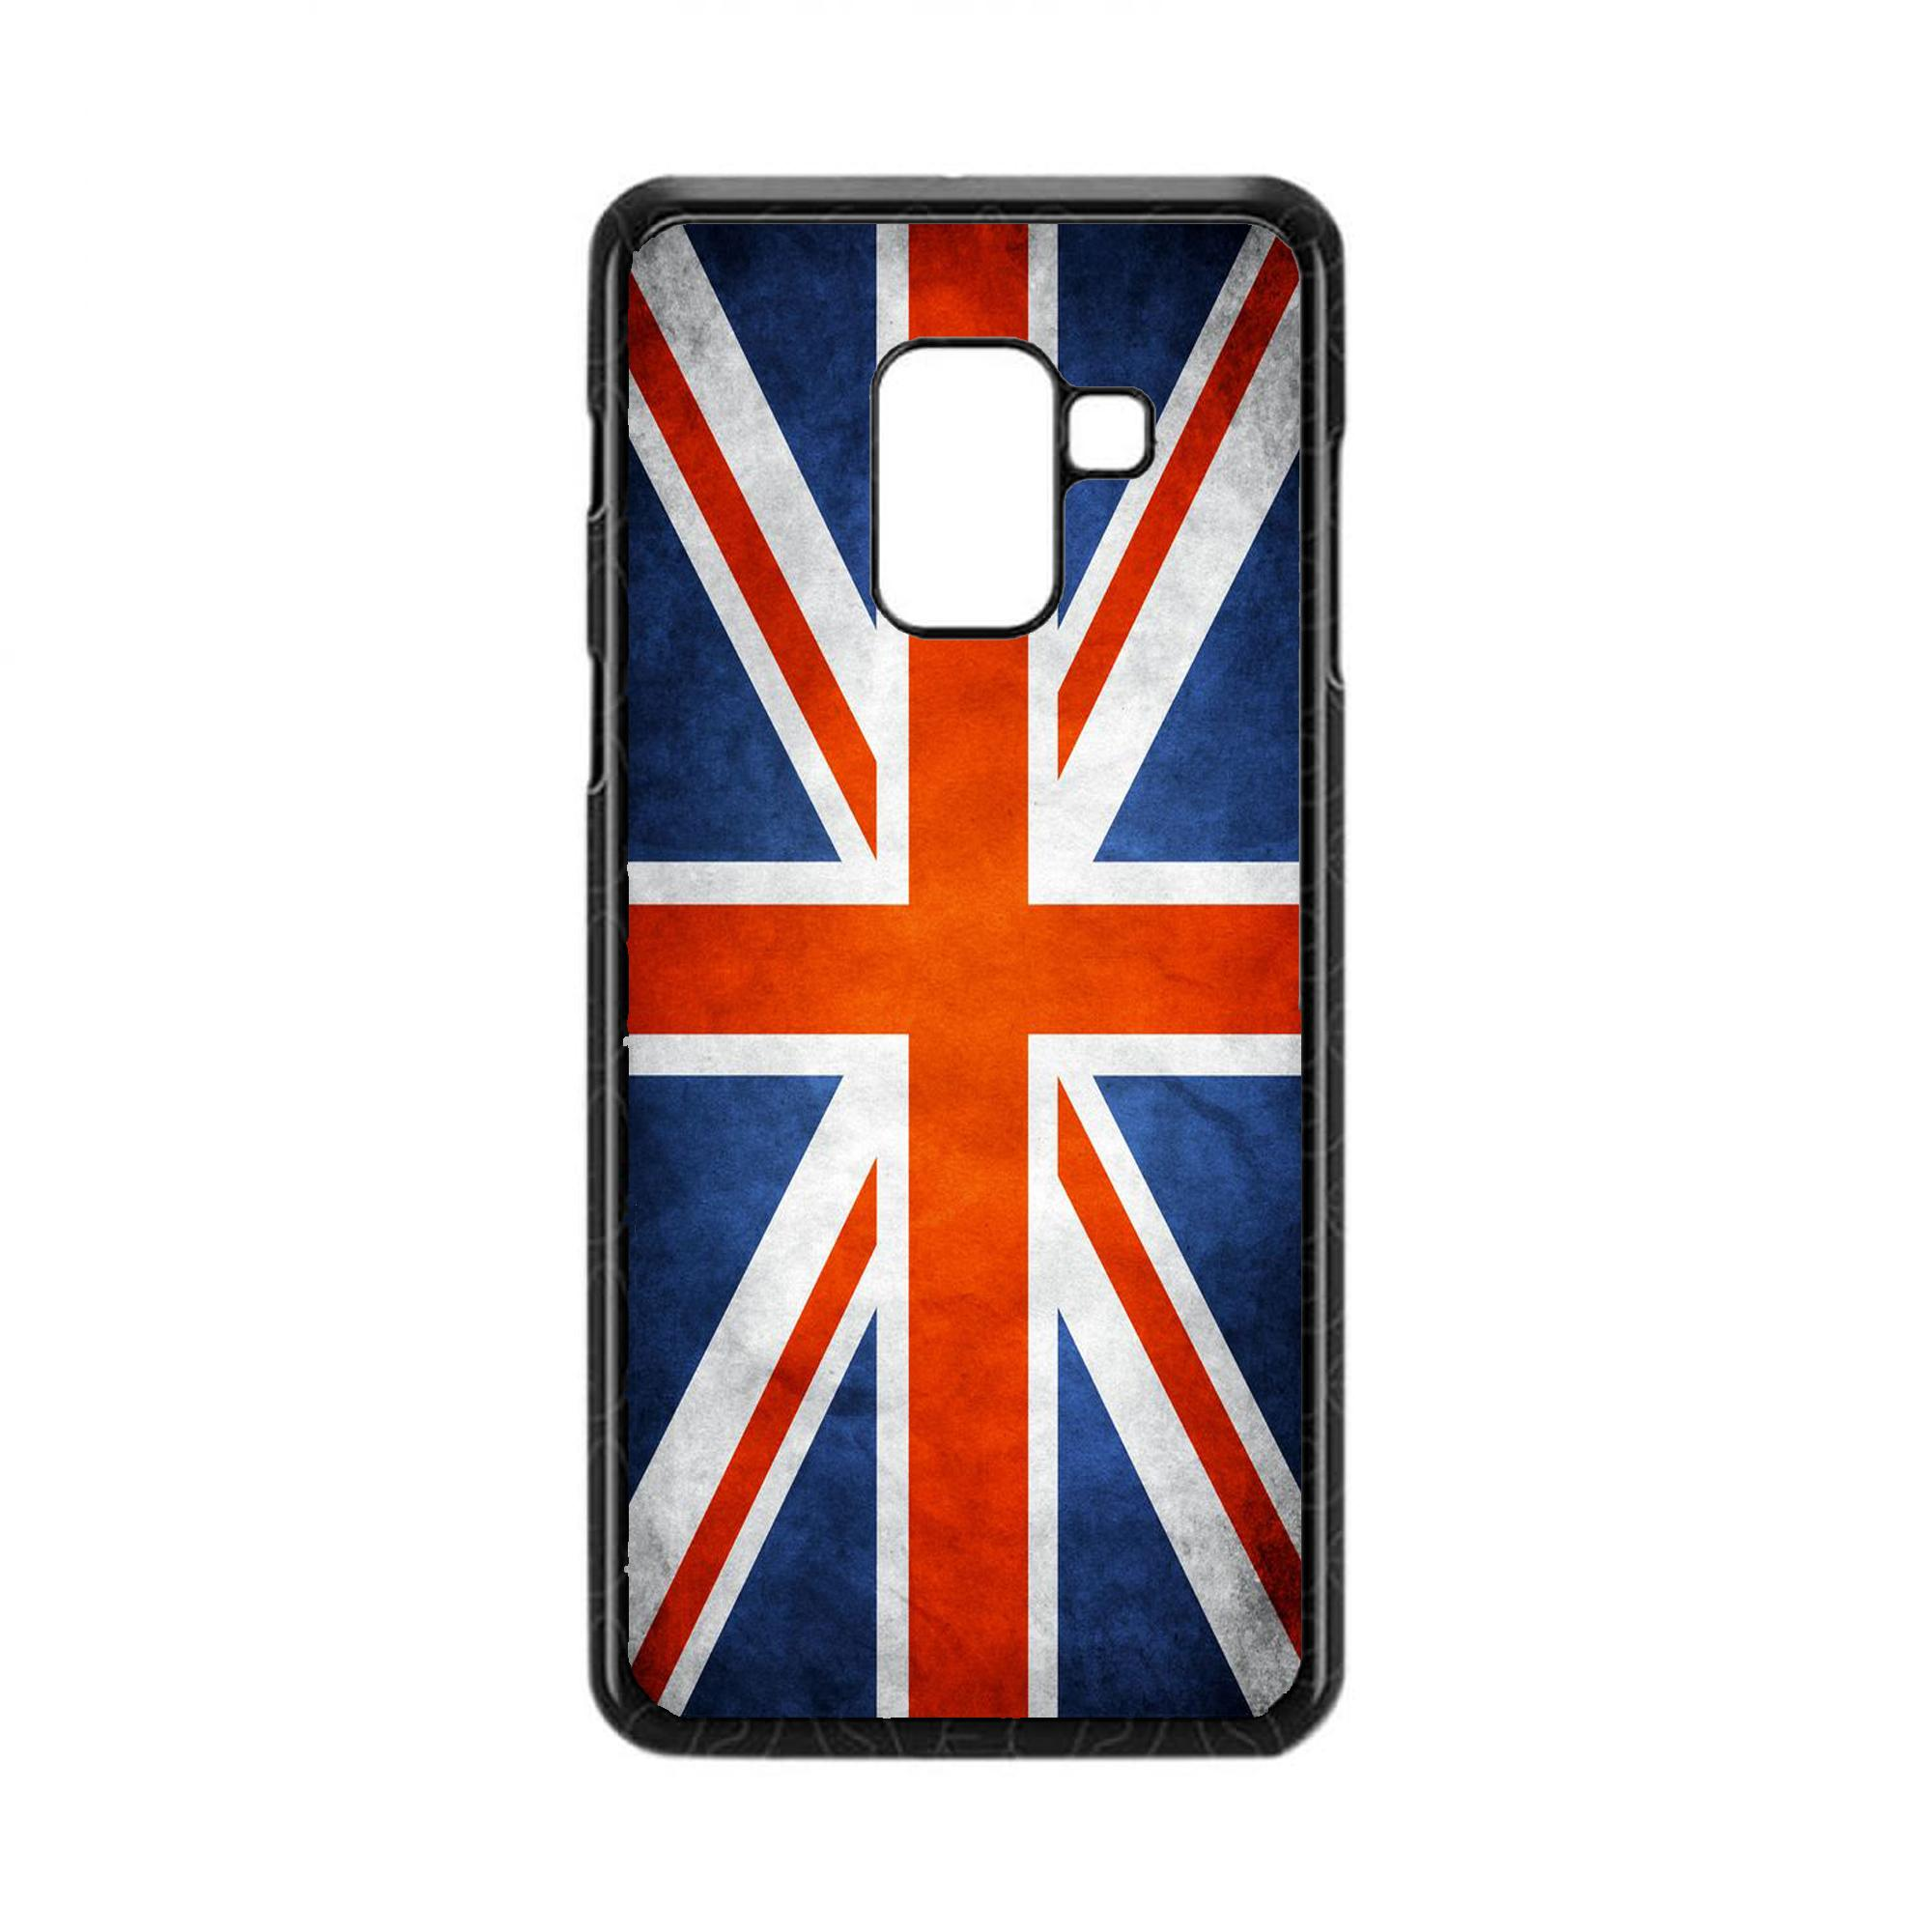 Features Rajamurah Fashion Printing Case Samsung Galaxy J6 Plus 21